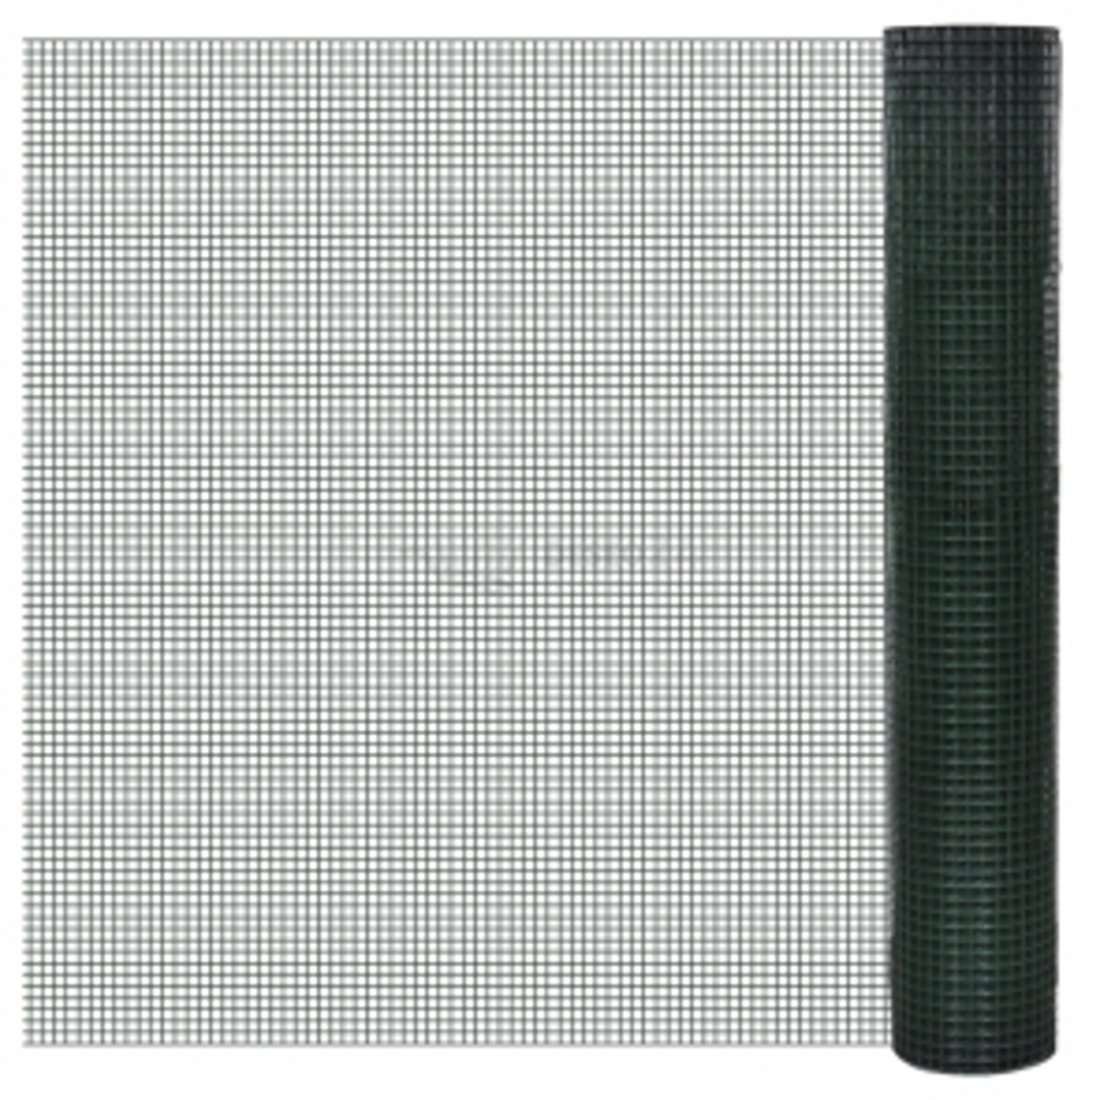 Chovatelské pletivo 1 x 25 m, pozinkované a potažené PVC, oka 19x19 mm